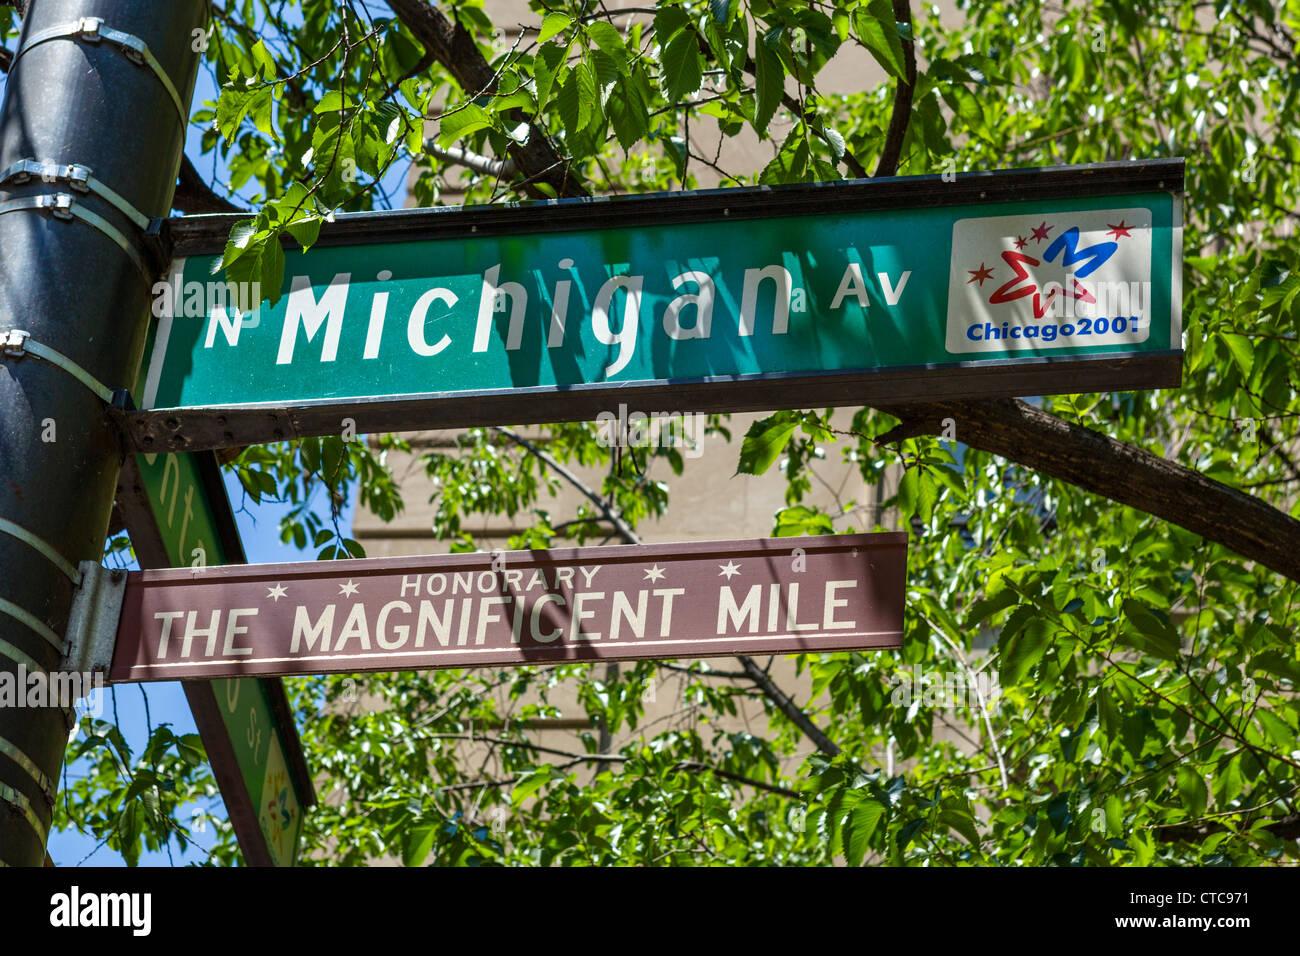 Magnificent Mile Straßenschild, Michigan Avenue, Chicago, Illinois, USA Stockbild